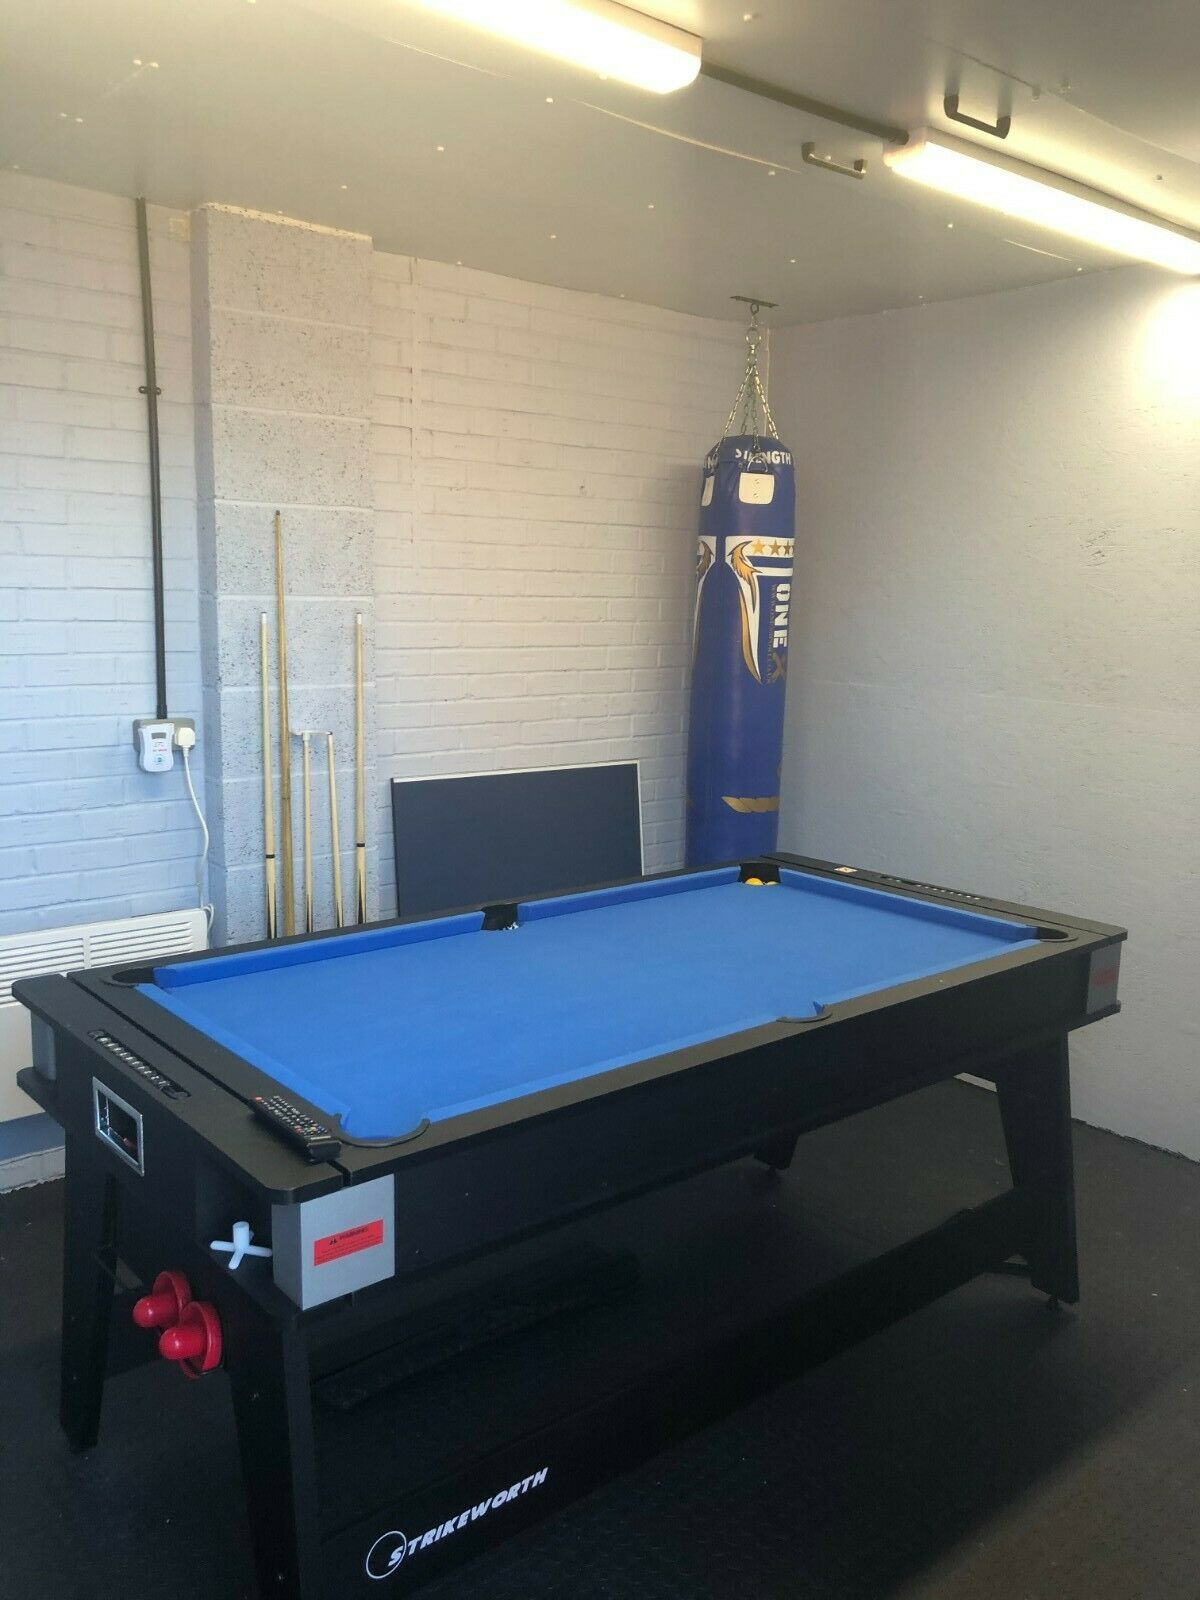 3in1 Multi Games Table  6ft Strikeworth, Pool, Table Tennis, Powered Air Hockey